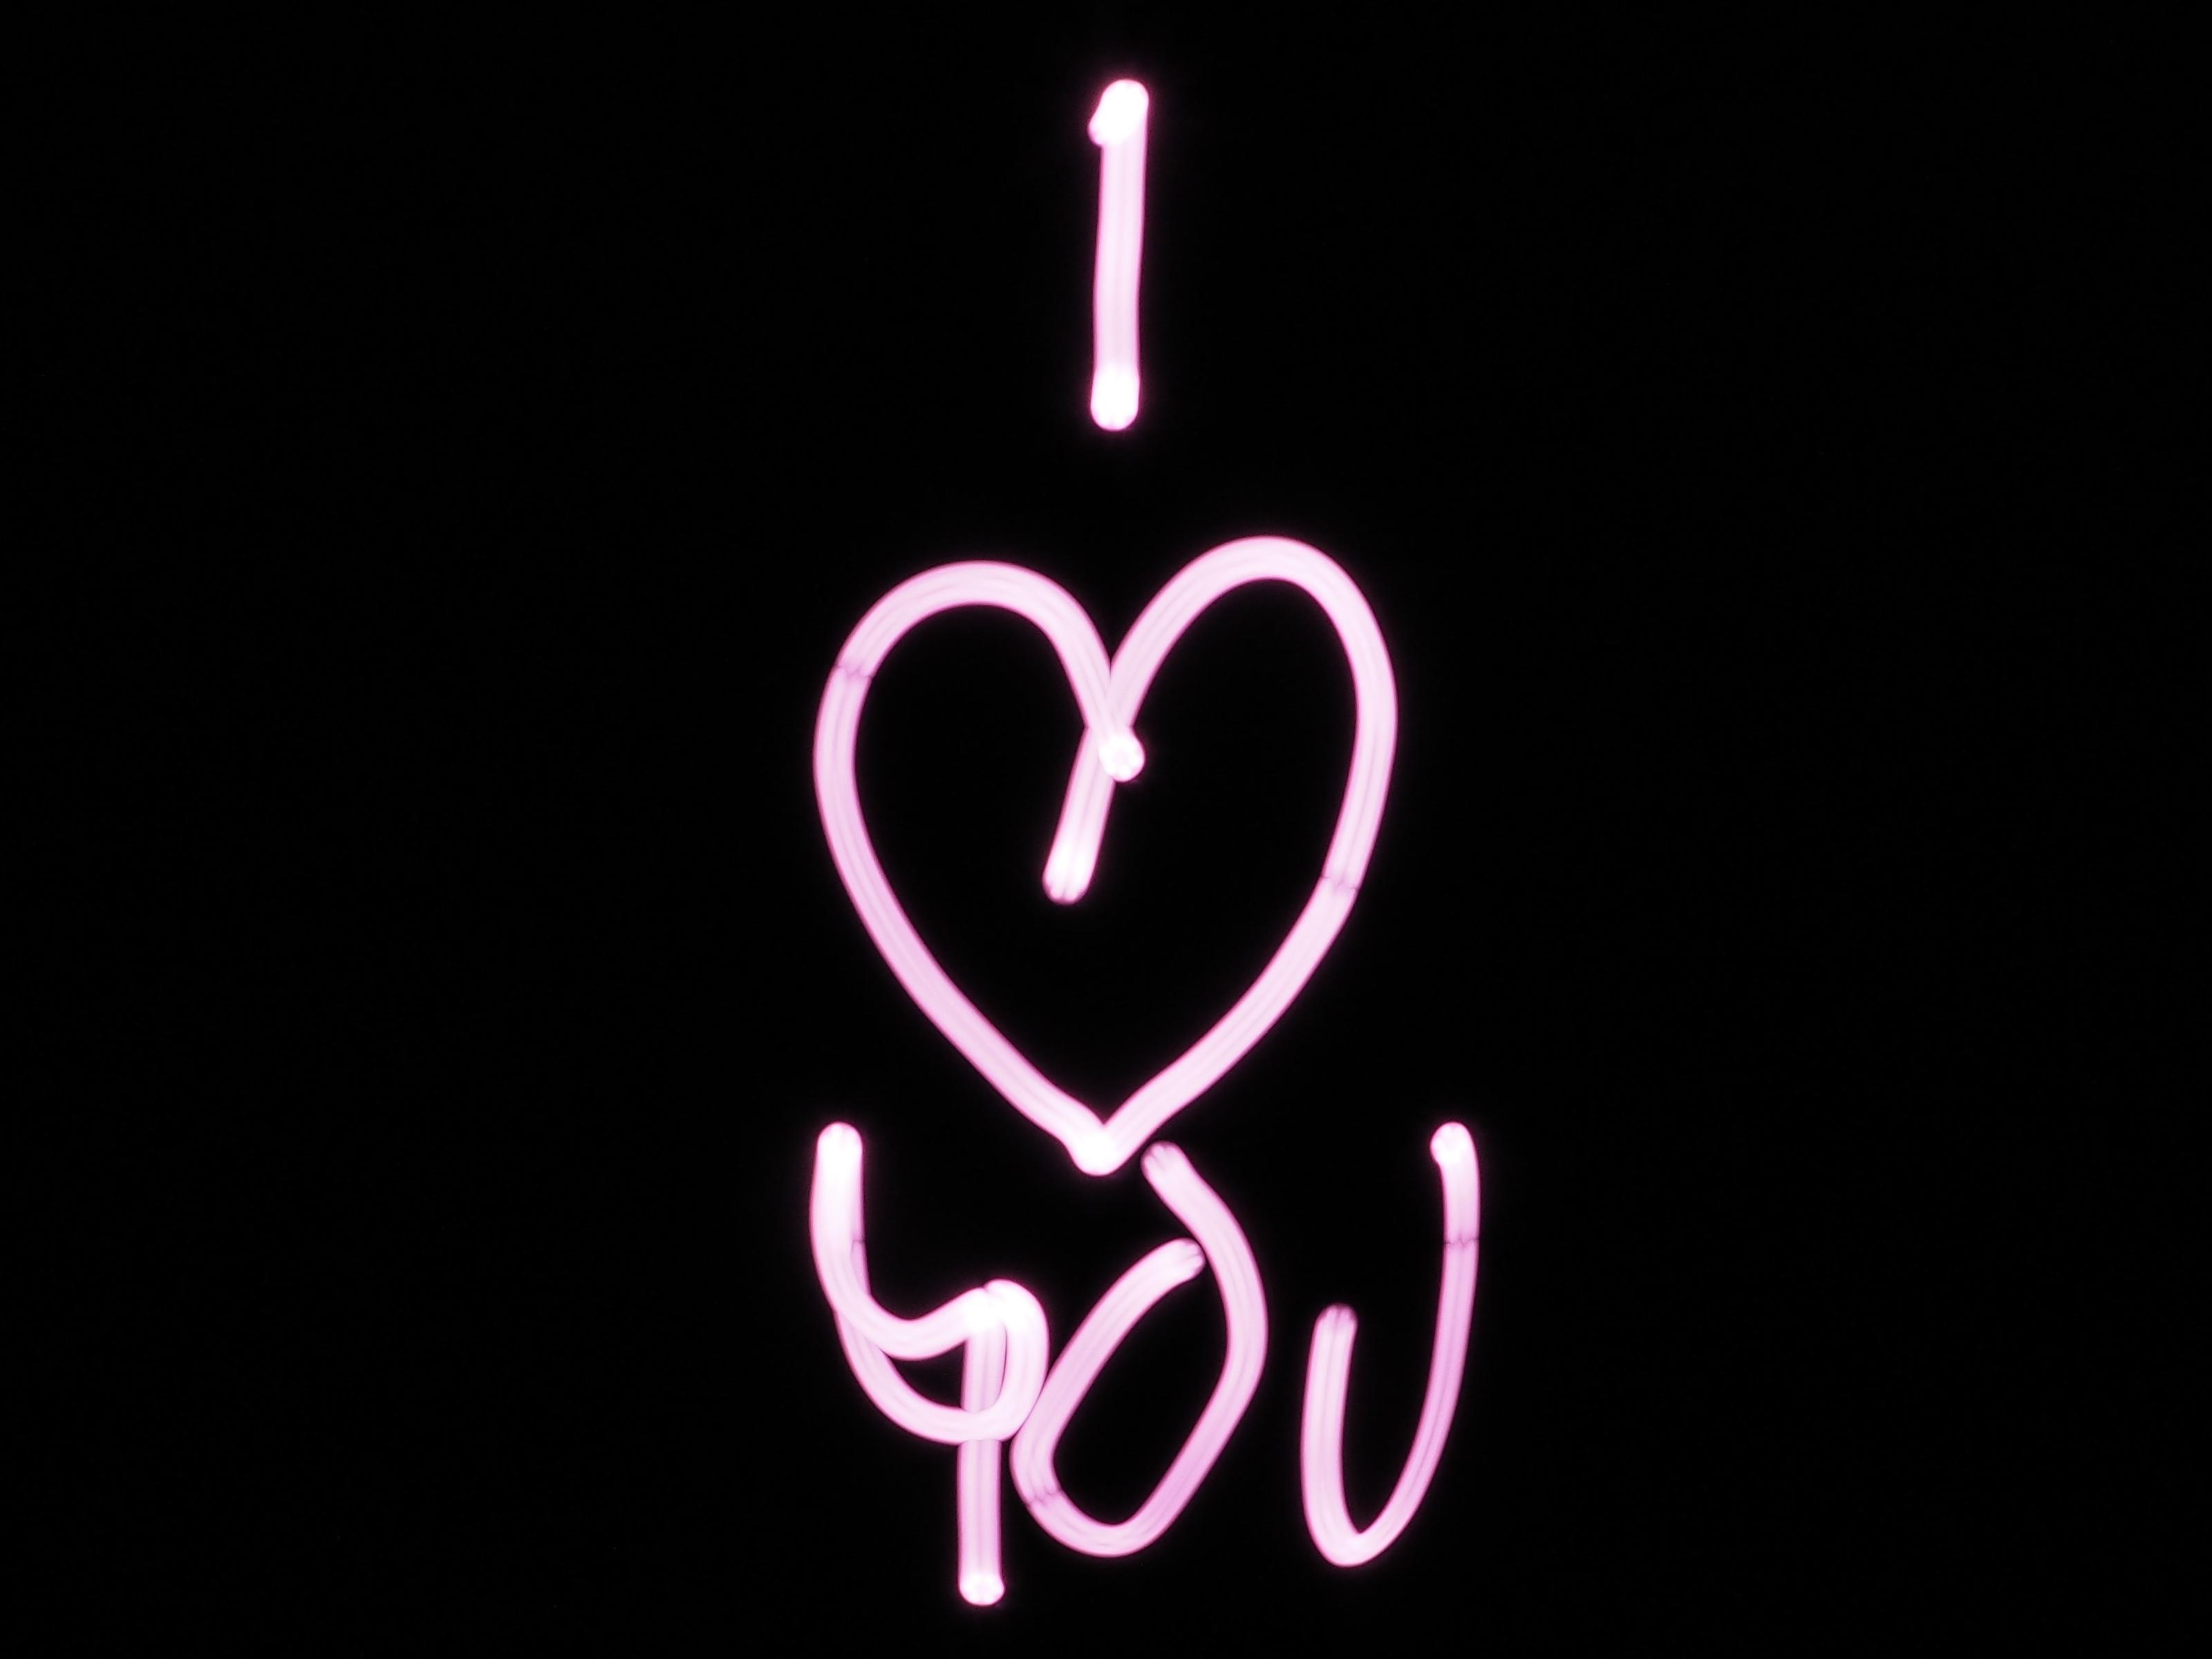 Free Images Writing Light Number Love Heart Symbol Alphabet